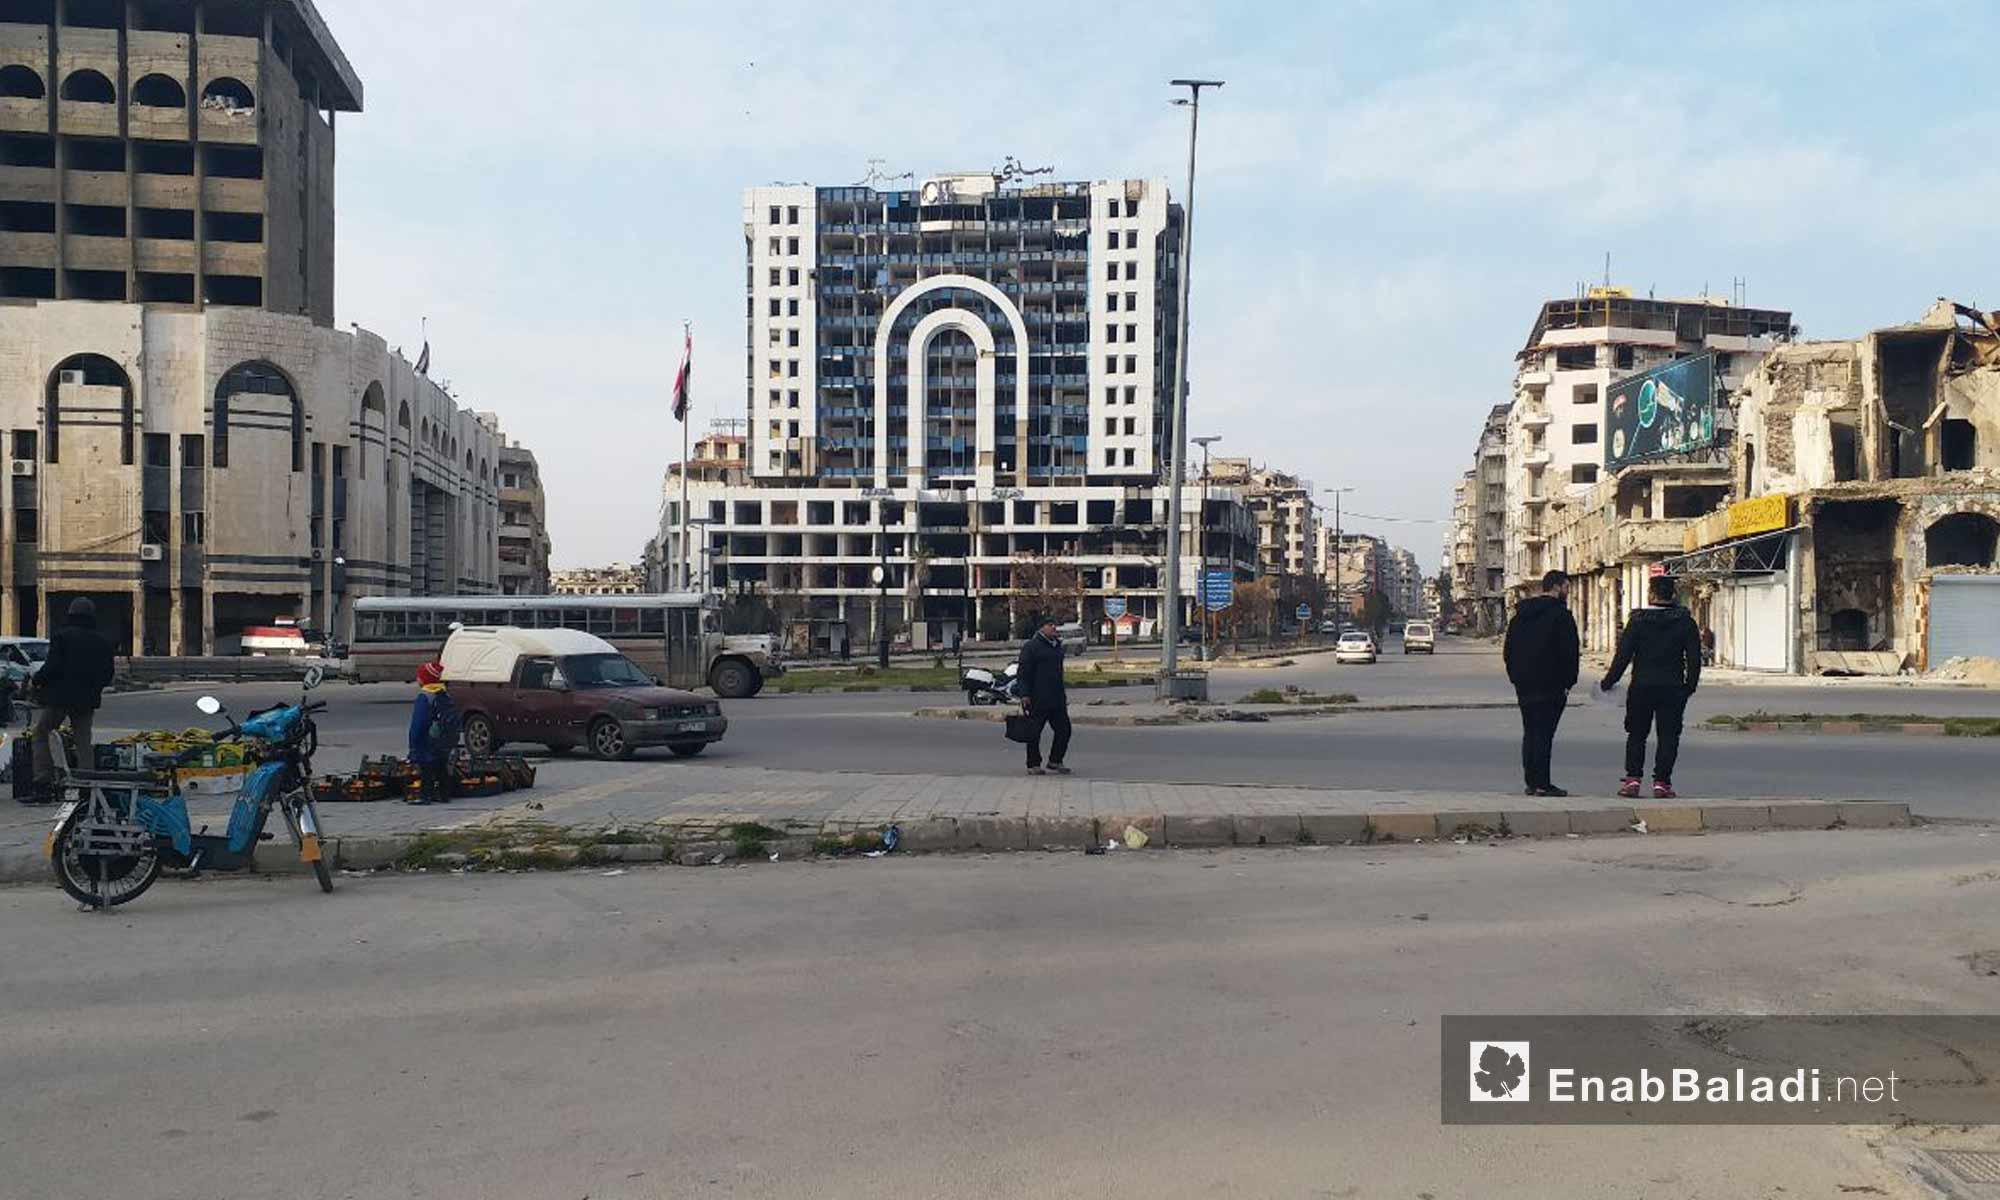 City Center Compound, central Homs city - January 24, 2019 (Enab Baladi)